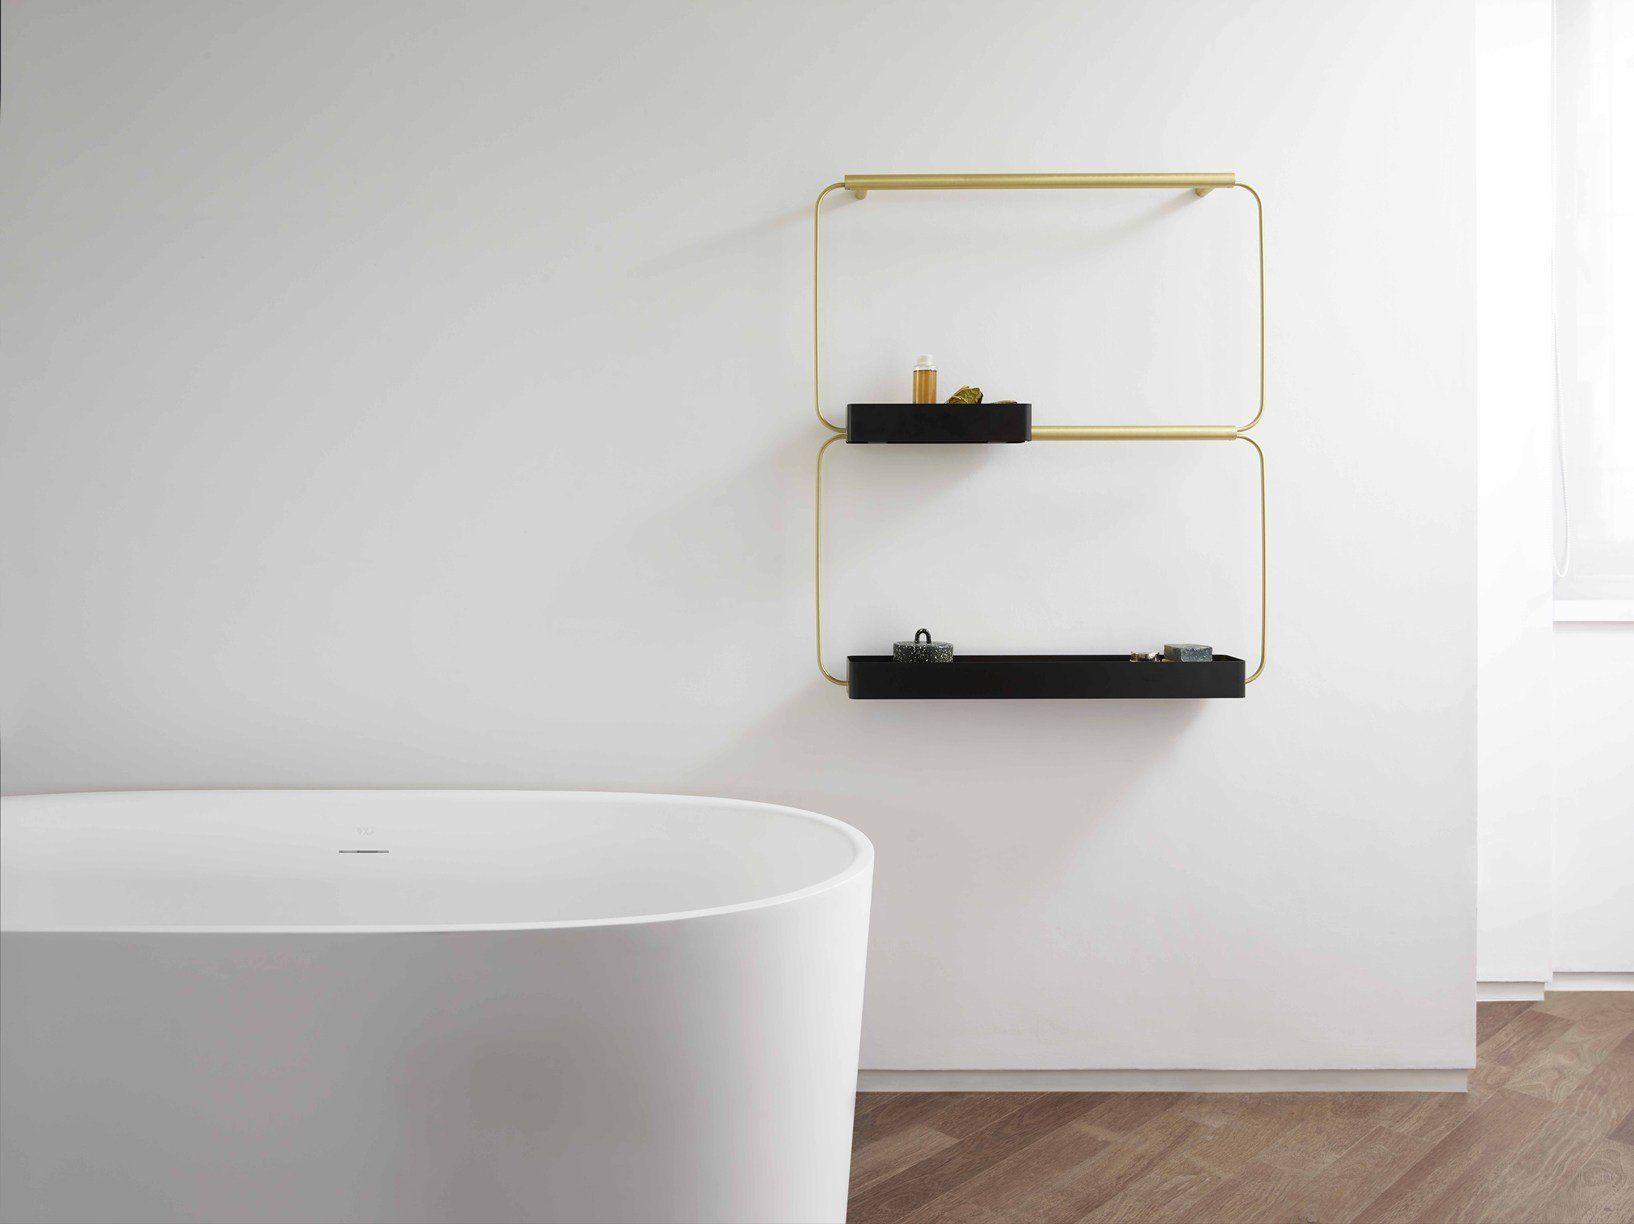 Vasca Da Bagno Spagnolo : Vasca da bagno da design moderno quadra modello york in bianco